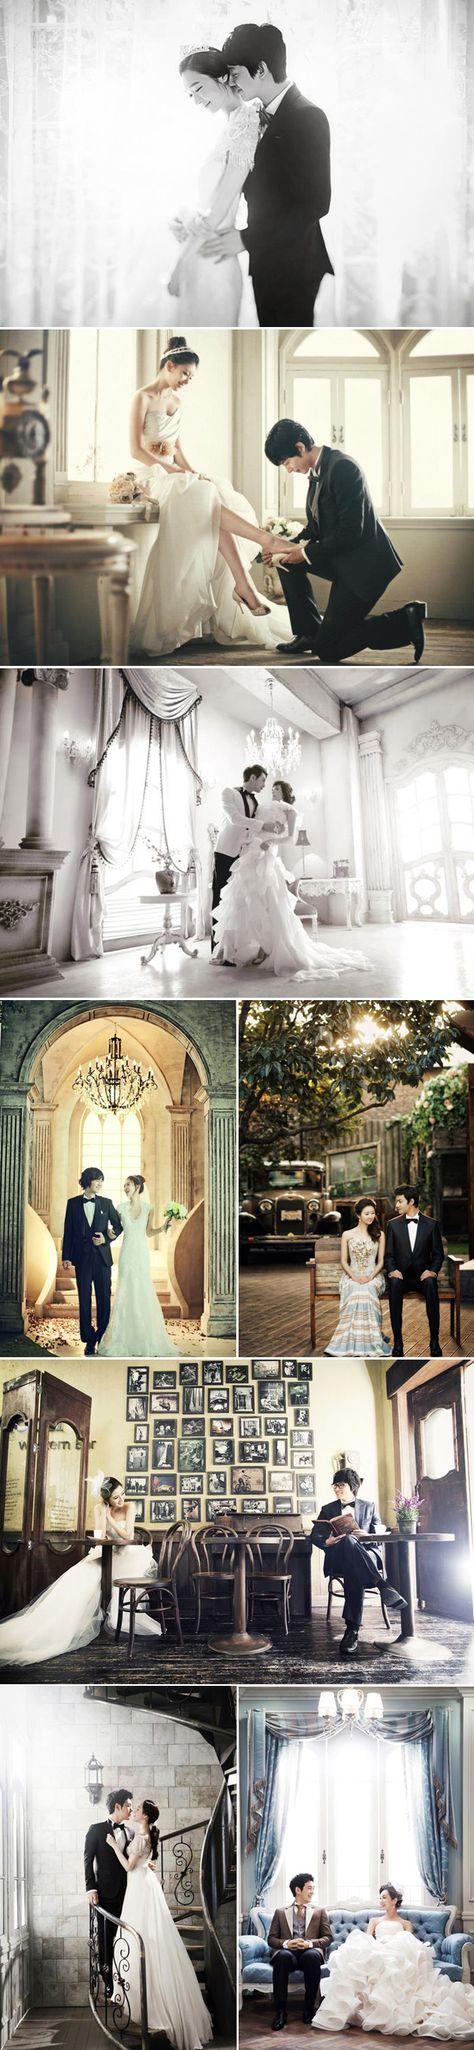 Korean Wedding Photography Wedding Ideas Pinterest Korean